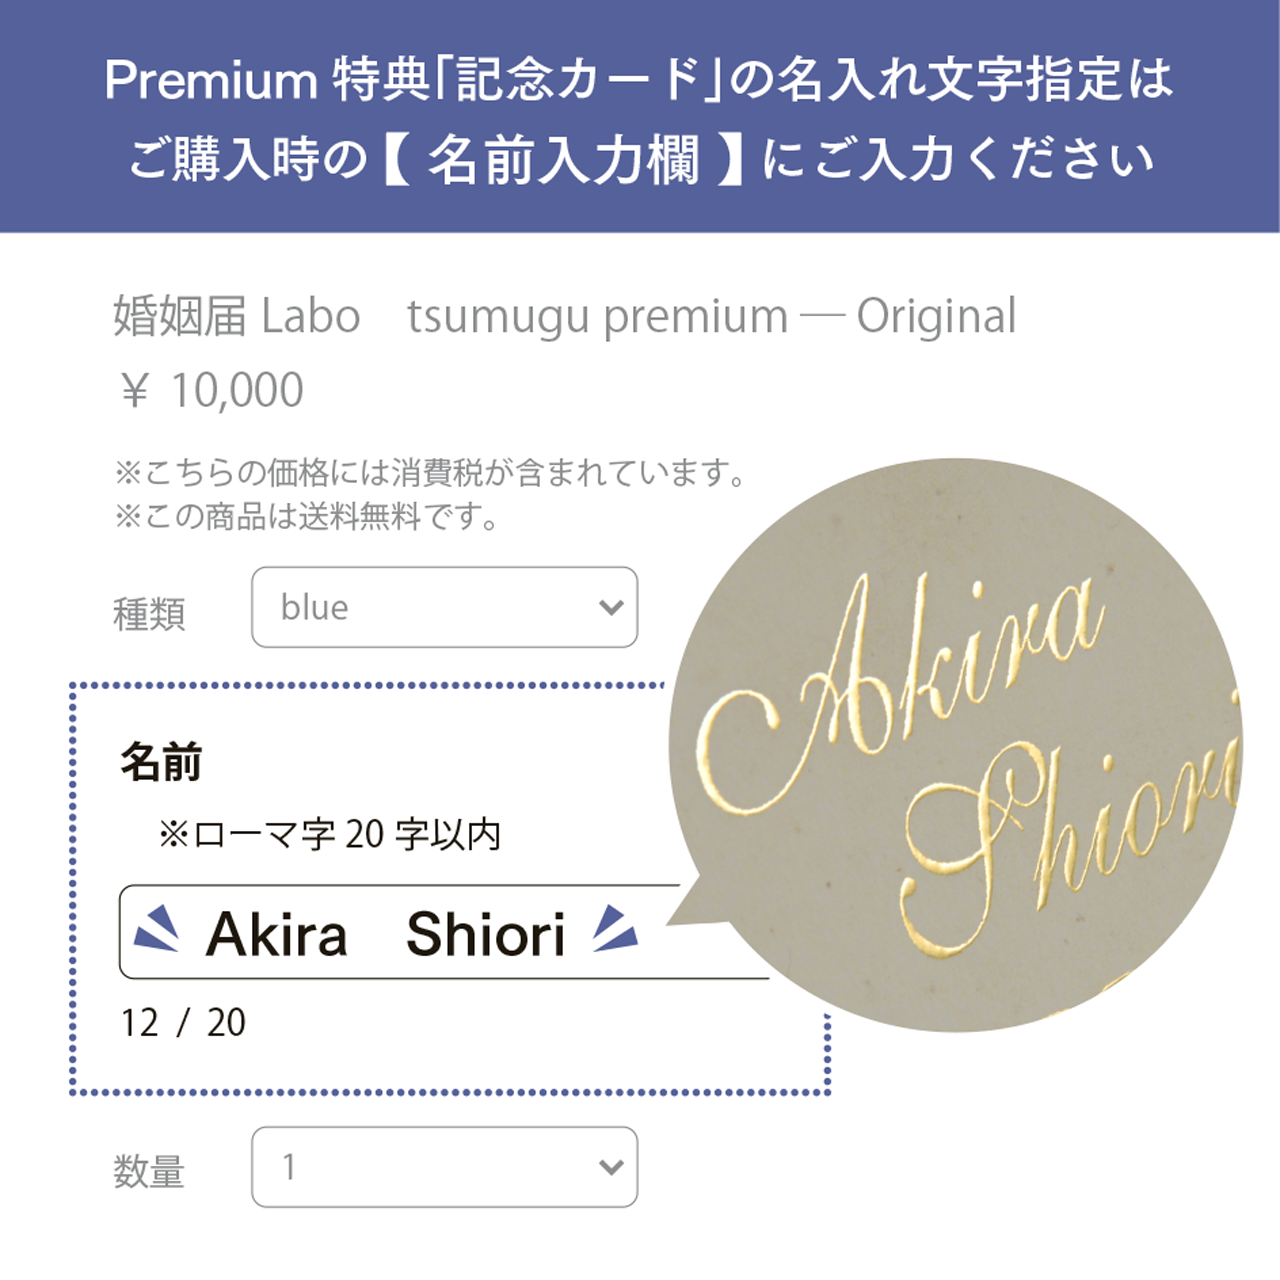 【June Brideキャンペーン】婚姻届Labo tsumugu premiumーOriginal